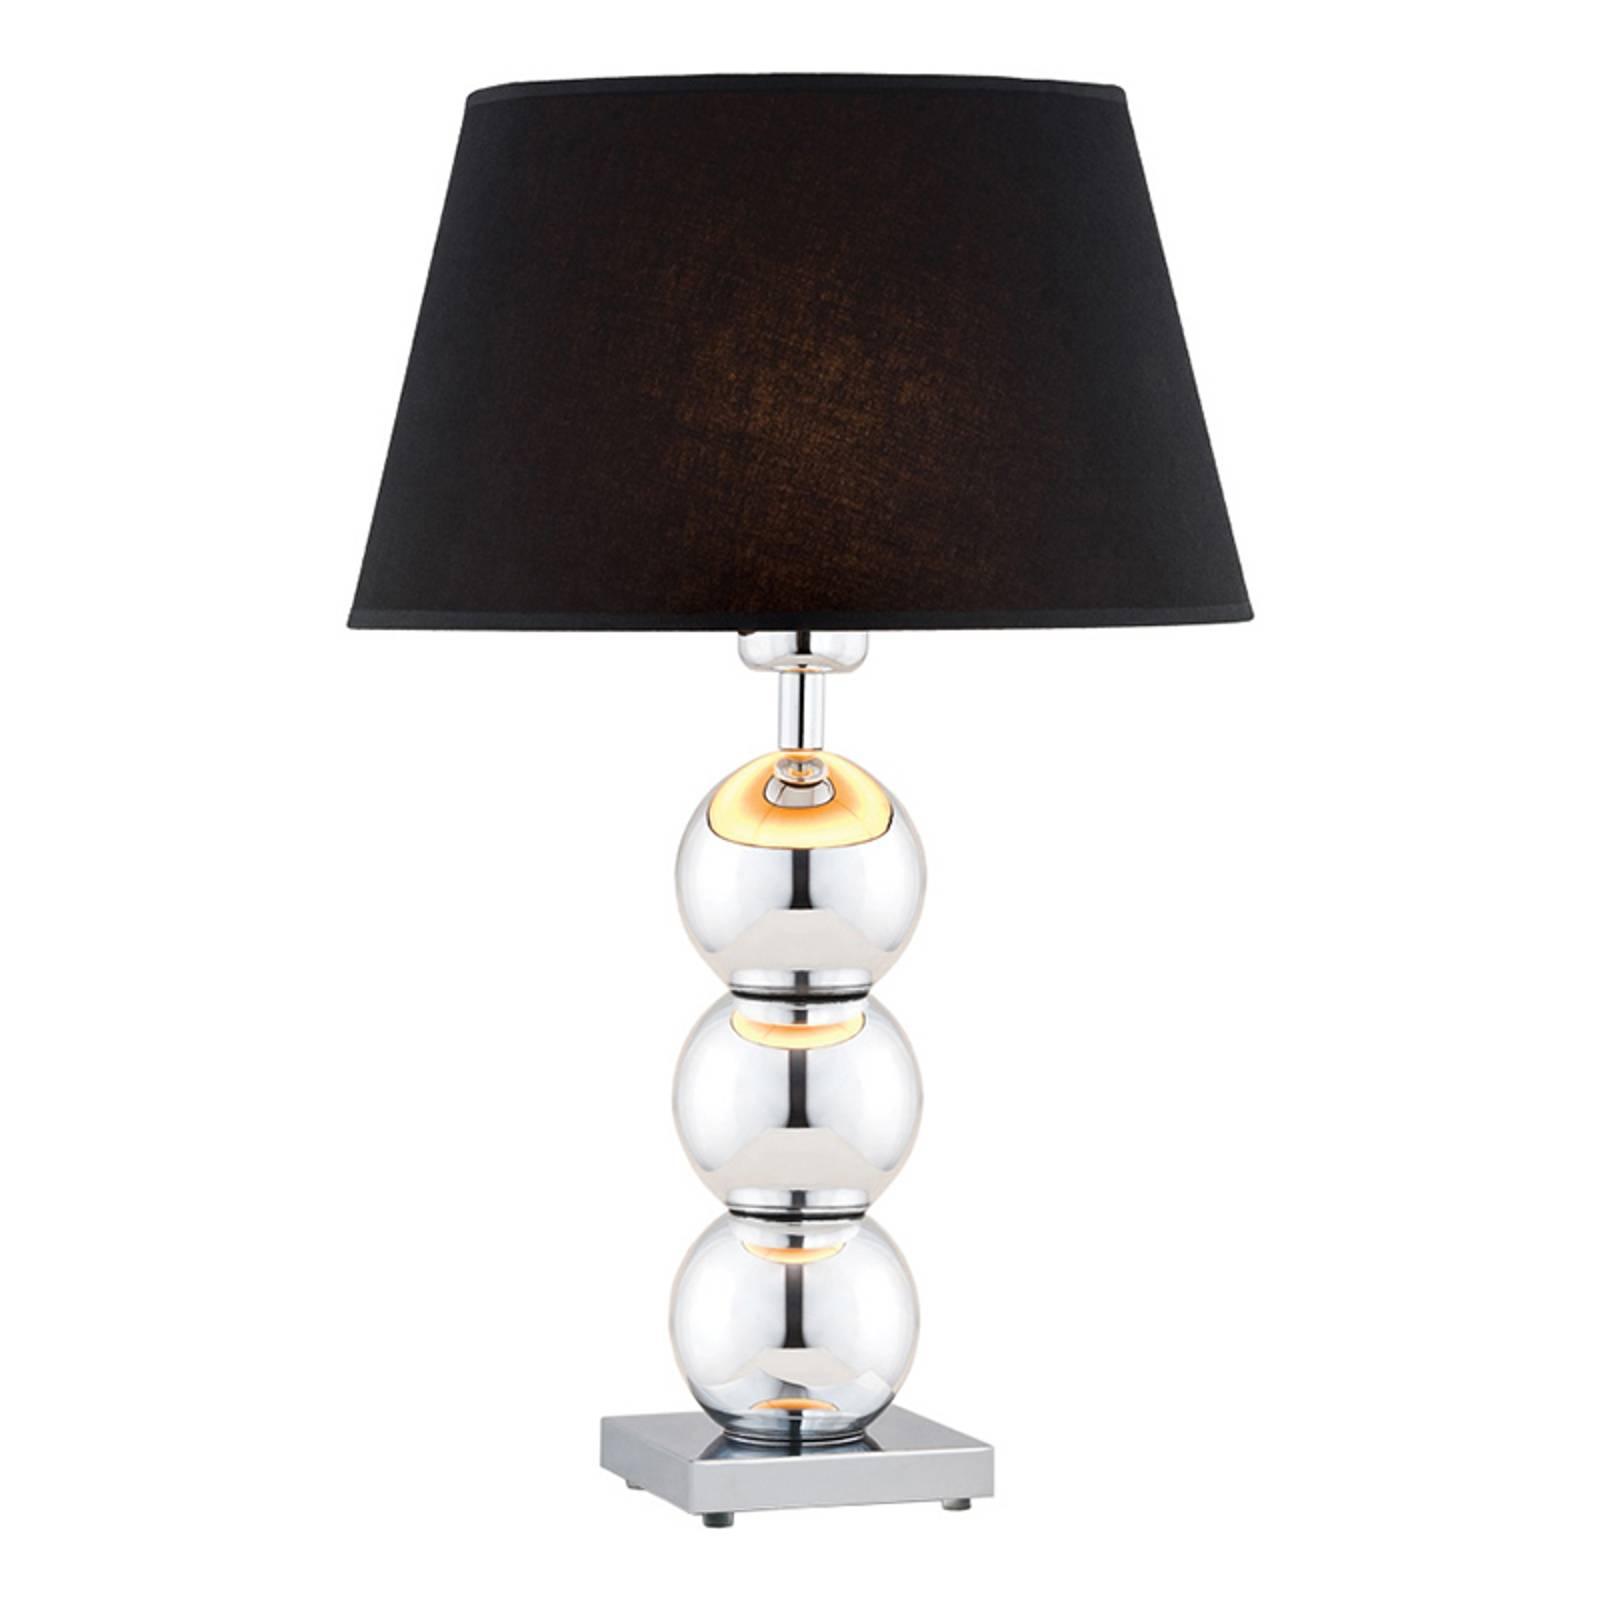 Pöytälamppu Fulda, musta varjostin, kromattu jalka